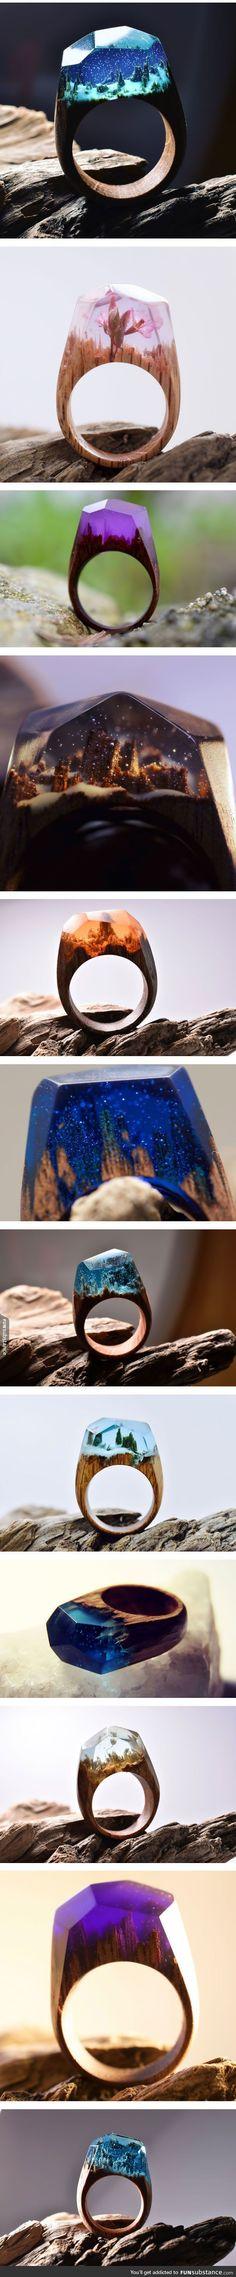 Miniature Worlds Created Inside These Wooden Rings: http://designwrld.com/wooden-rings-secret-wood/